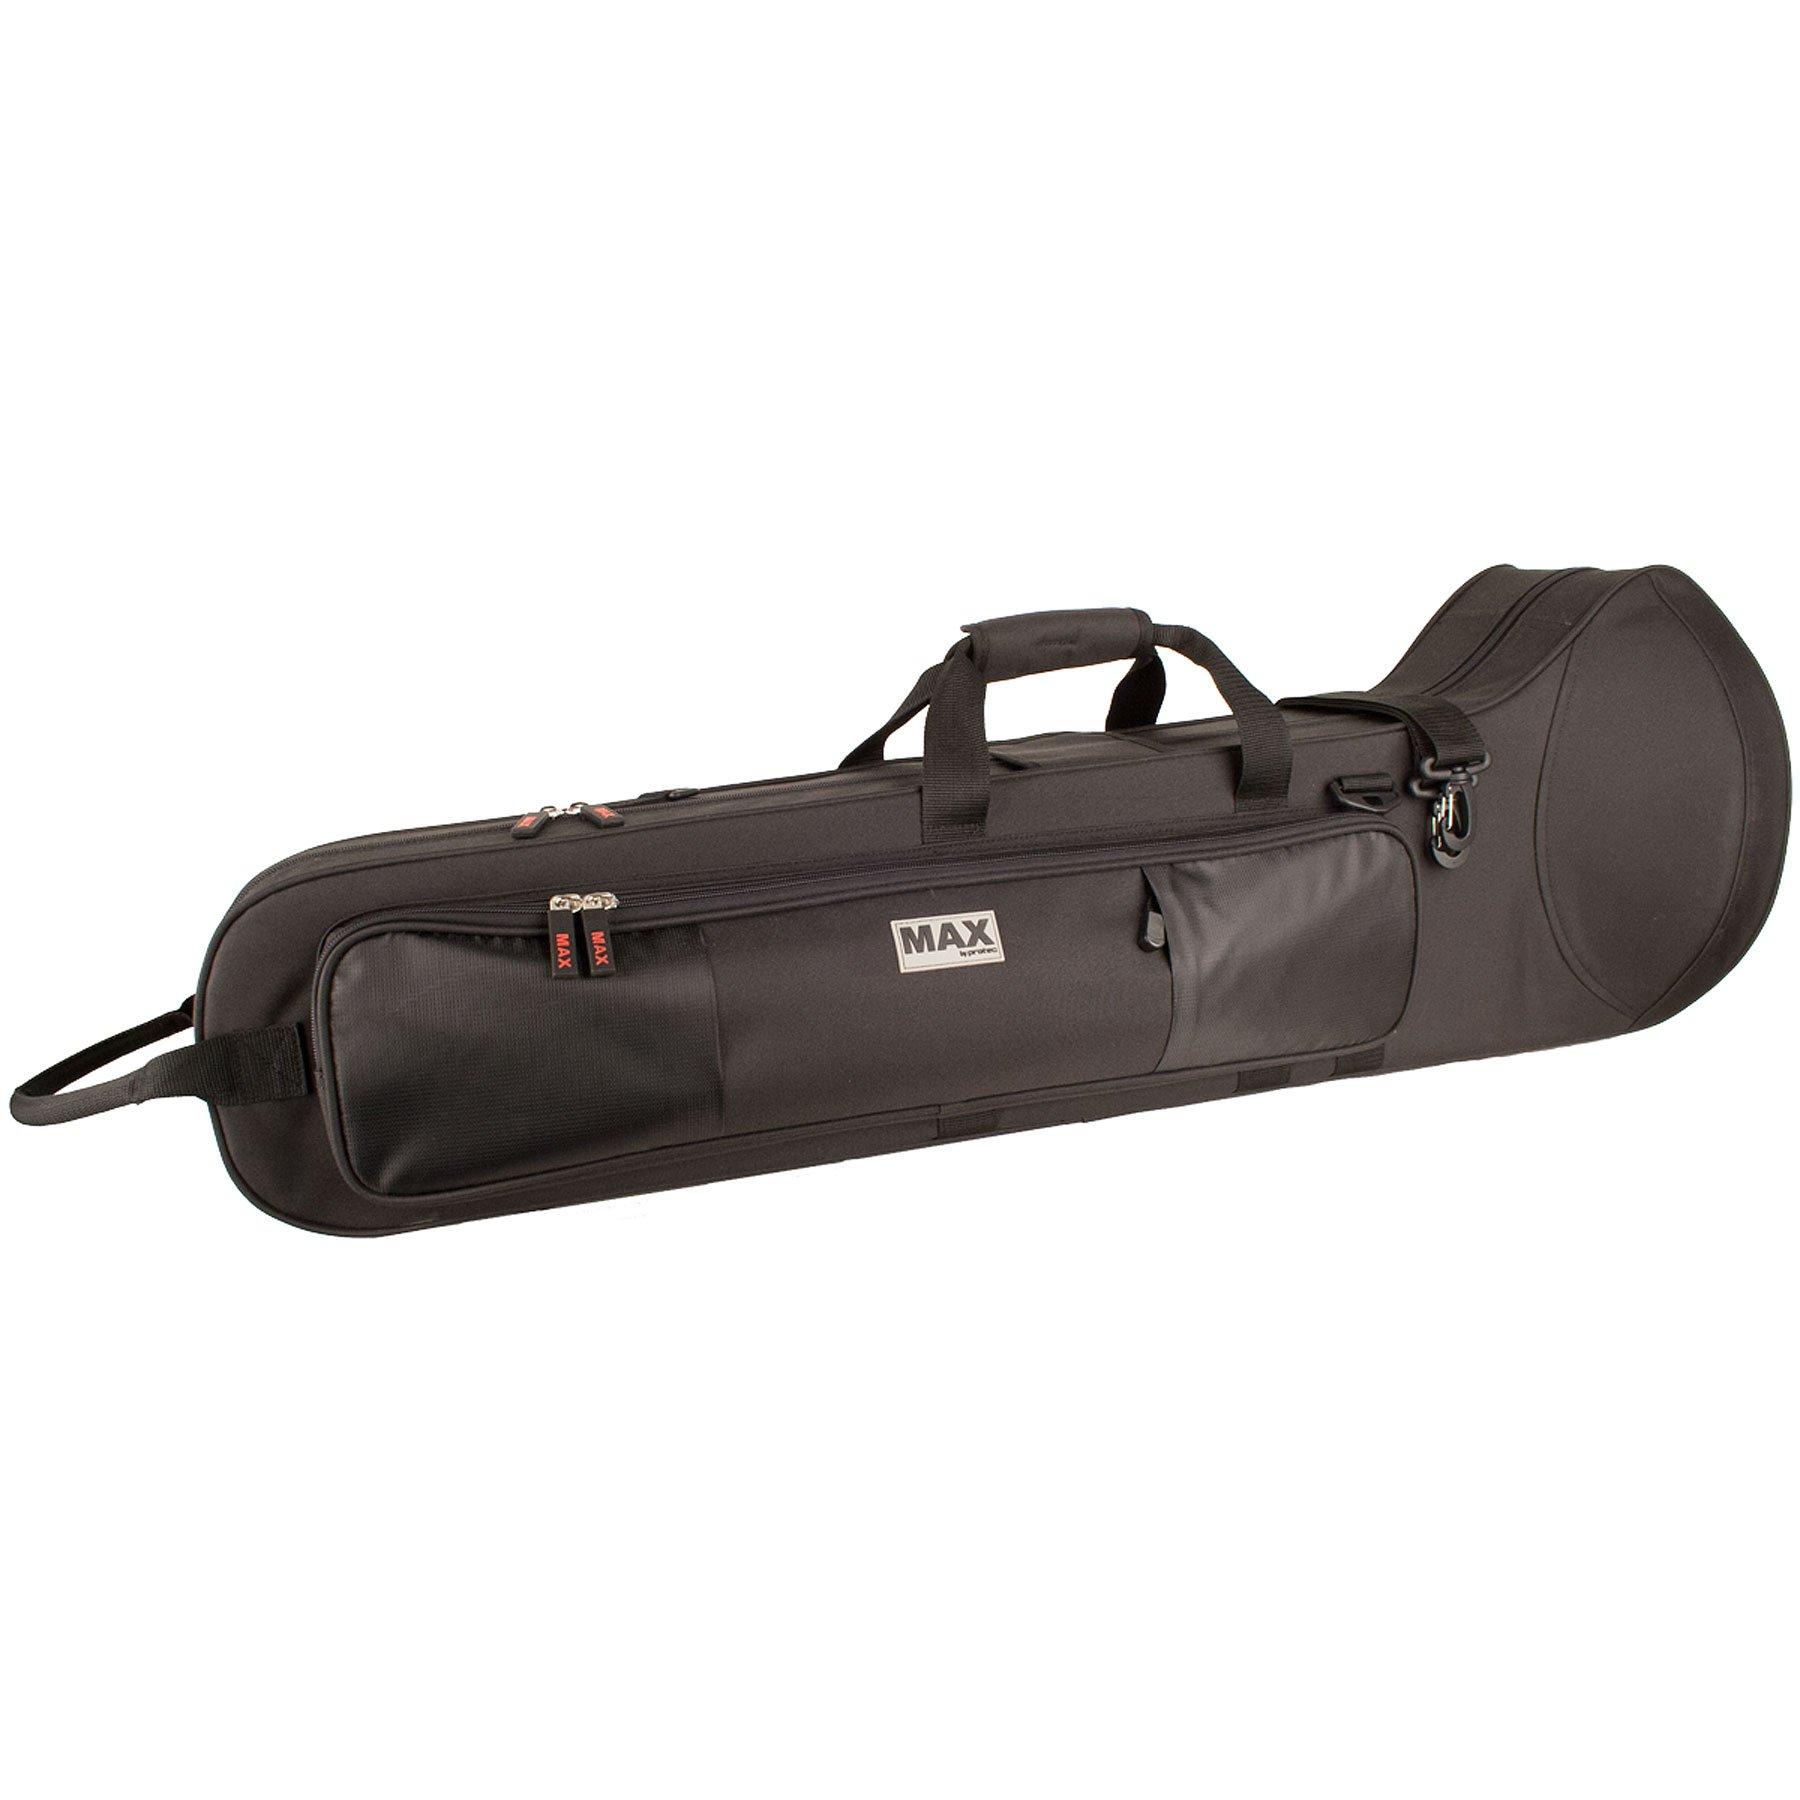 Protec MX309CT Bass Trombone MAX Contoured Case